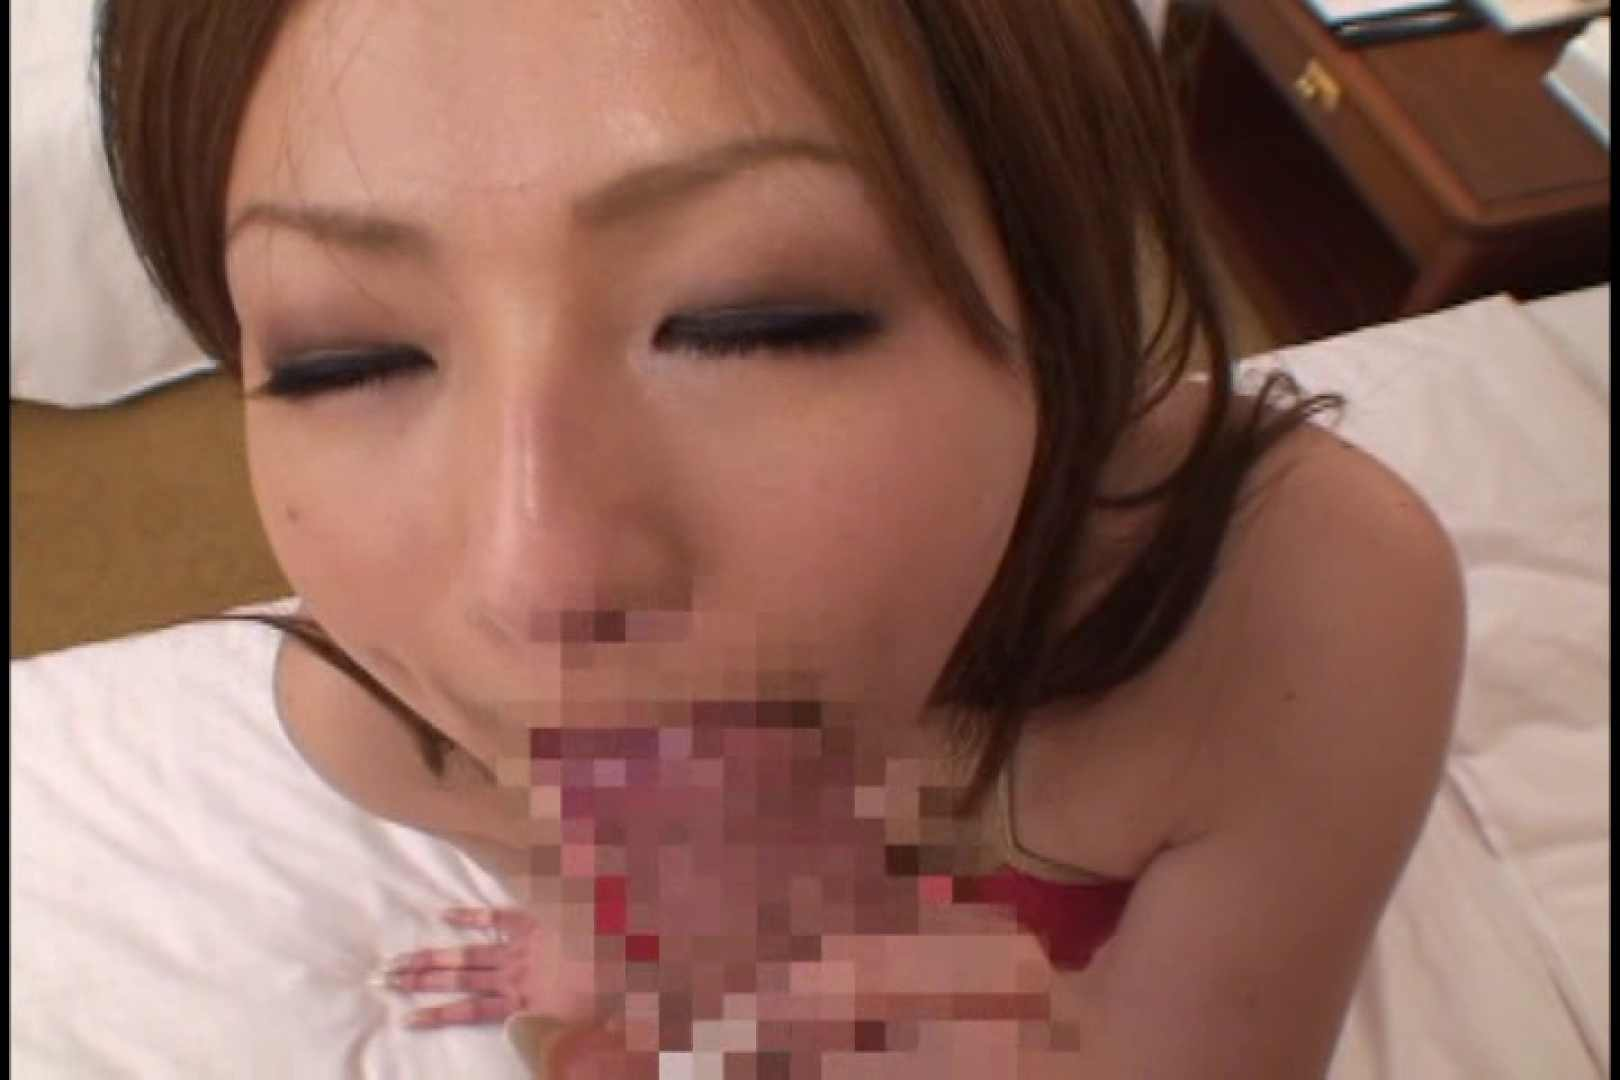 JDハンター全国ツアー vol.015 後編 女子大生のエロ動画  97PIX 86